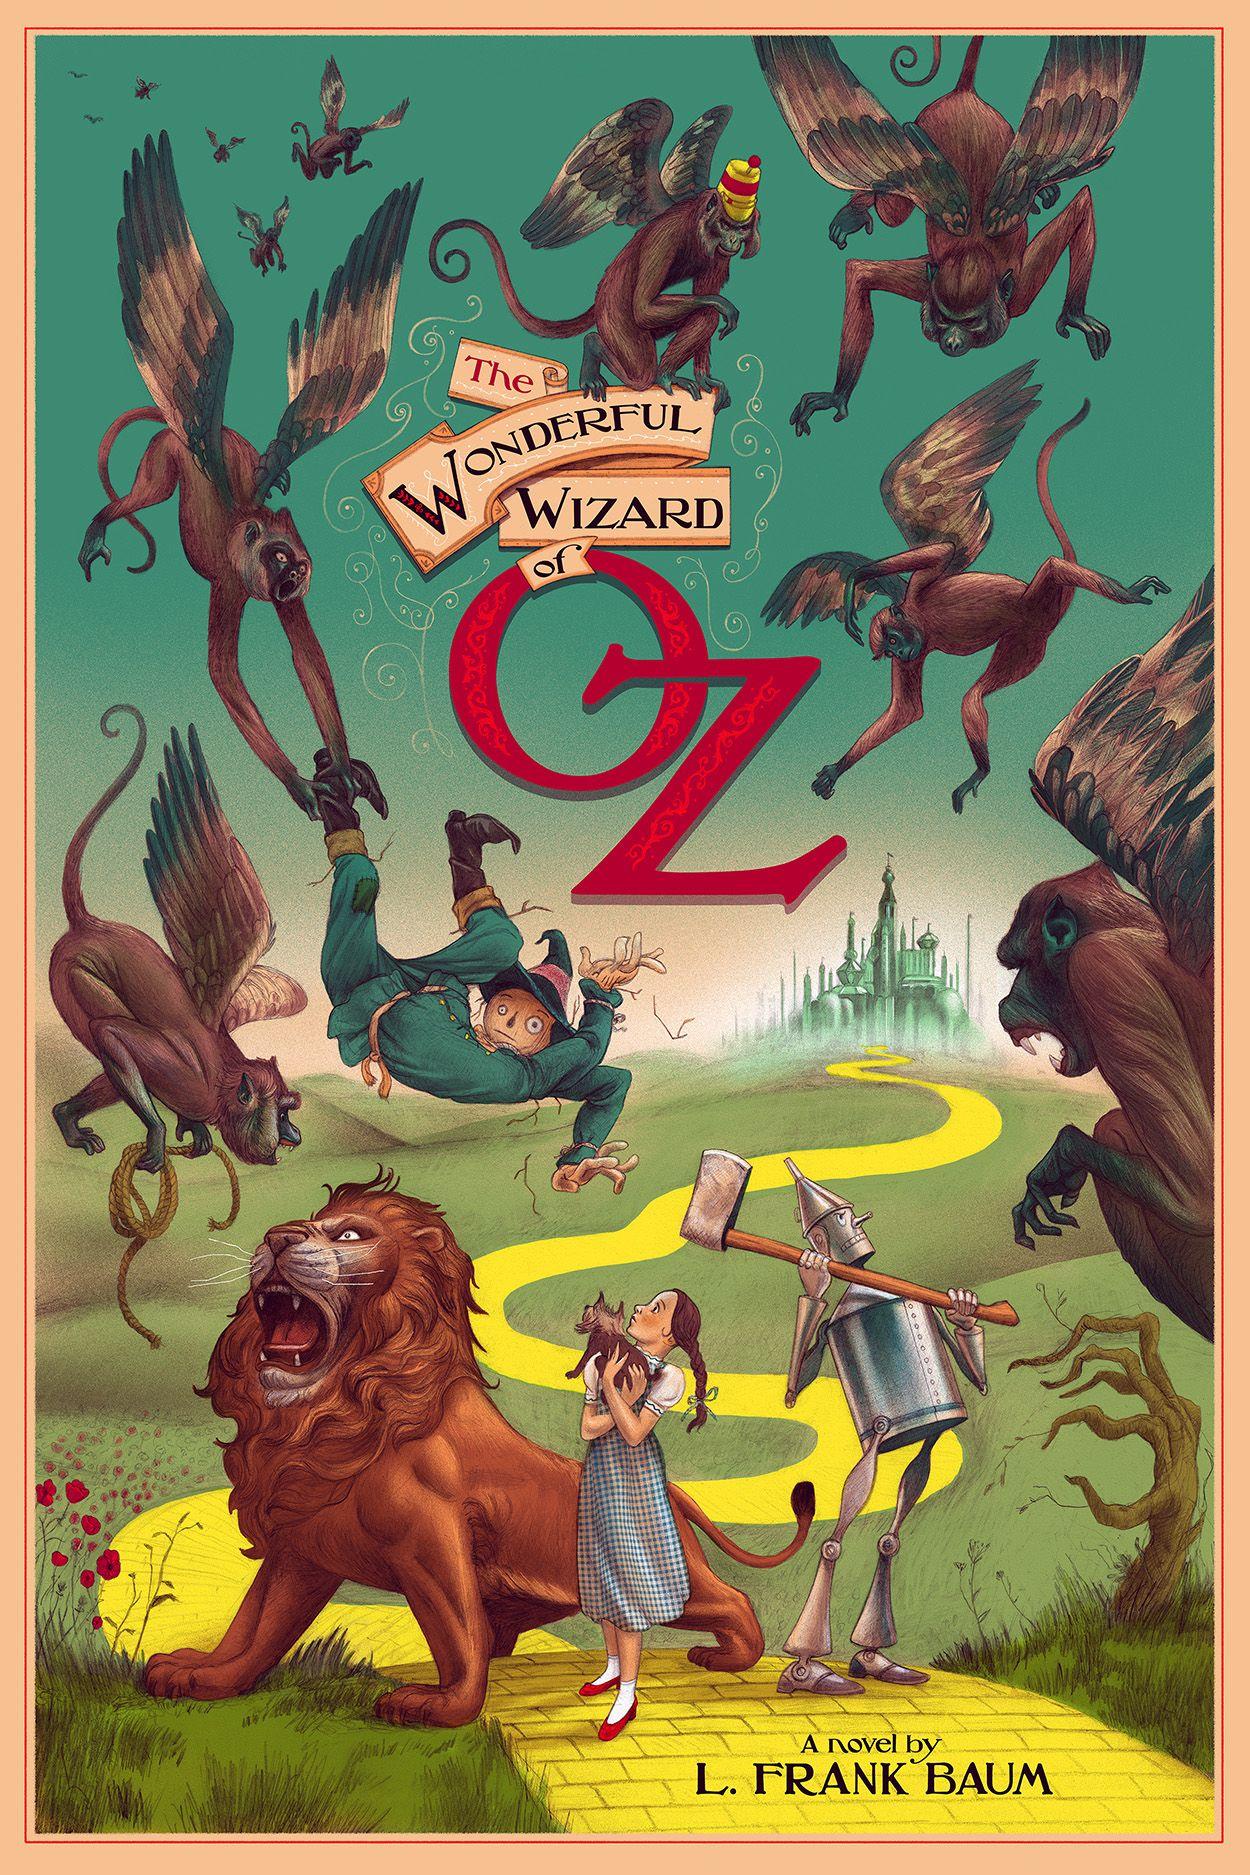 Jonathan Burton The Wizard Of Oz The Wonderful Wizard Of Oz Wizard Of Oz Movie Wizard Of Oz Book